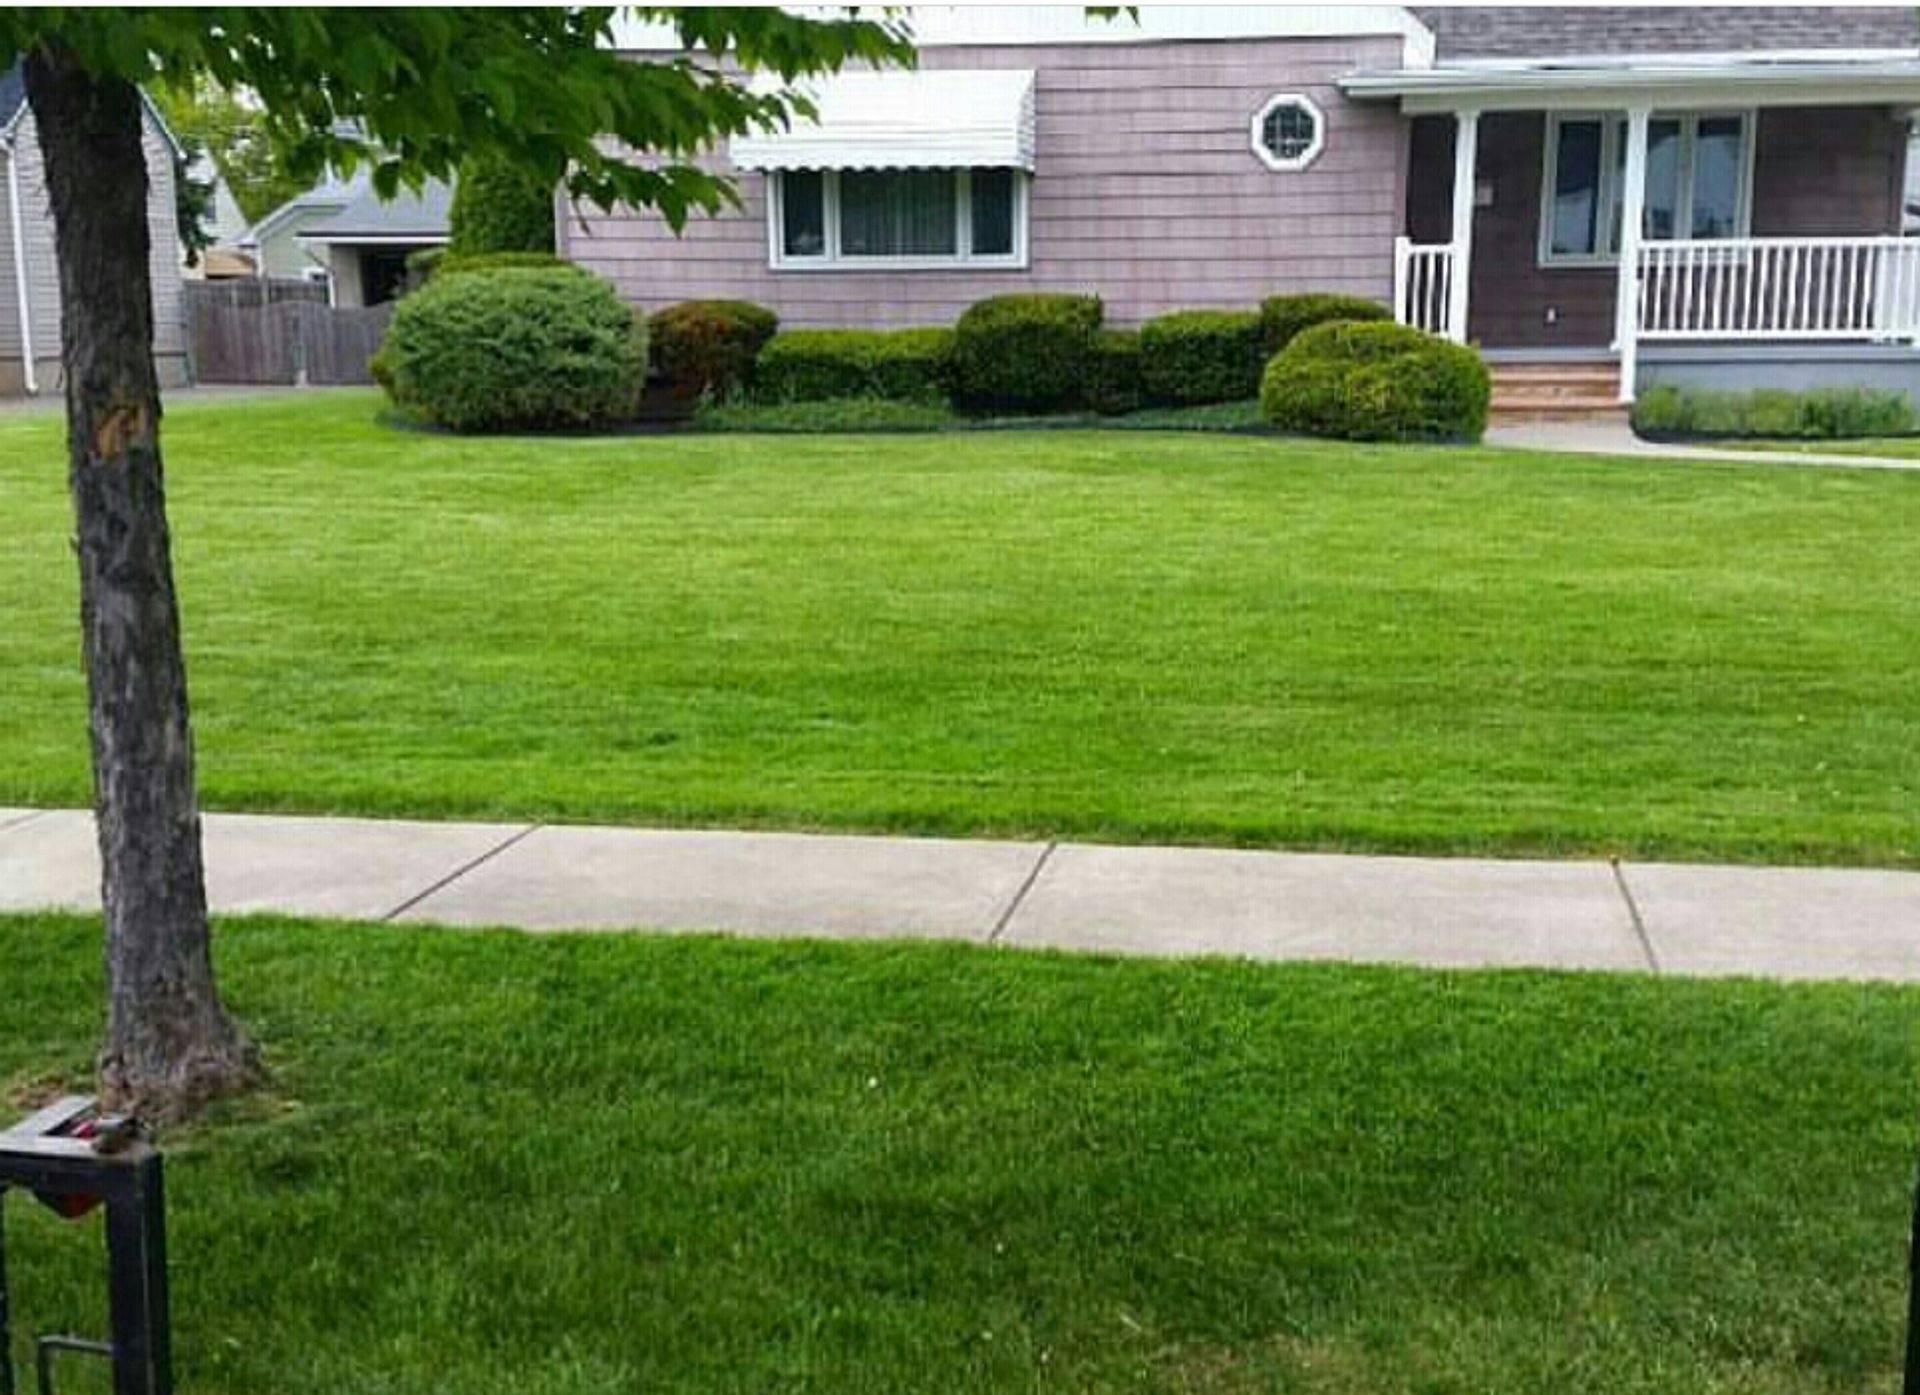 Lawn cutting service Yard Barber Lawn Service LLC